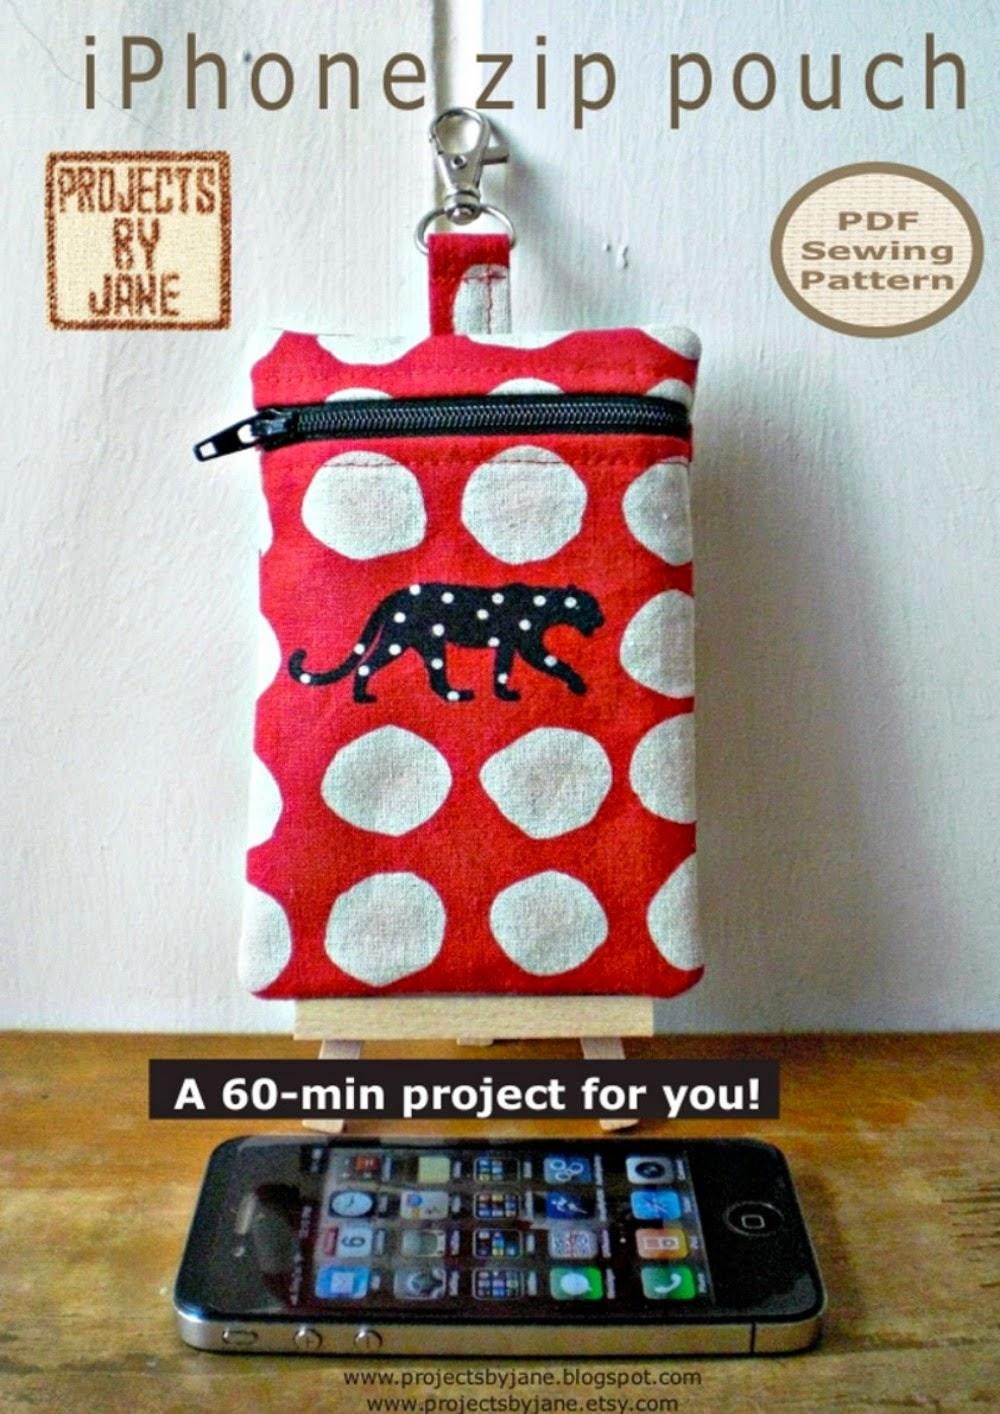 http://www.projectsbyjane.com/2013/04/iphonezippouchpattern.html